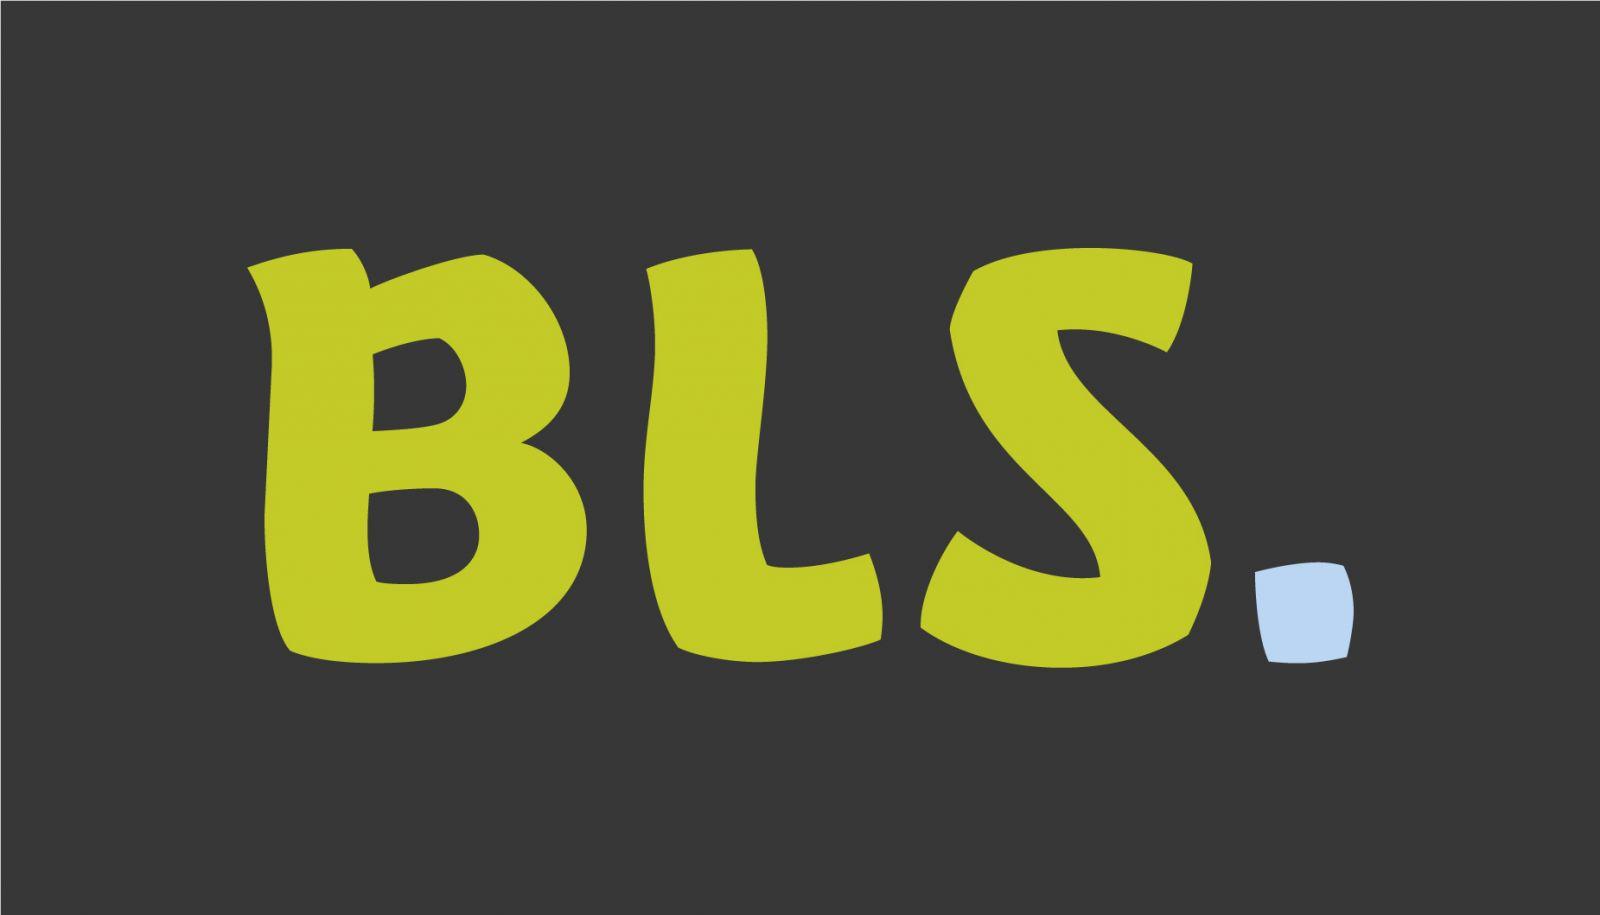 bls_rgb